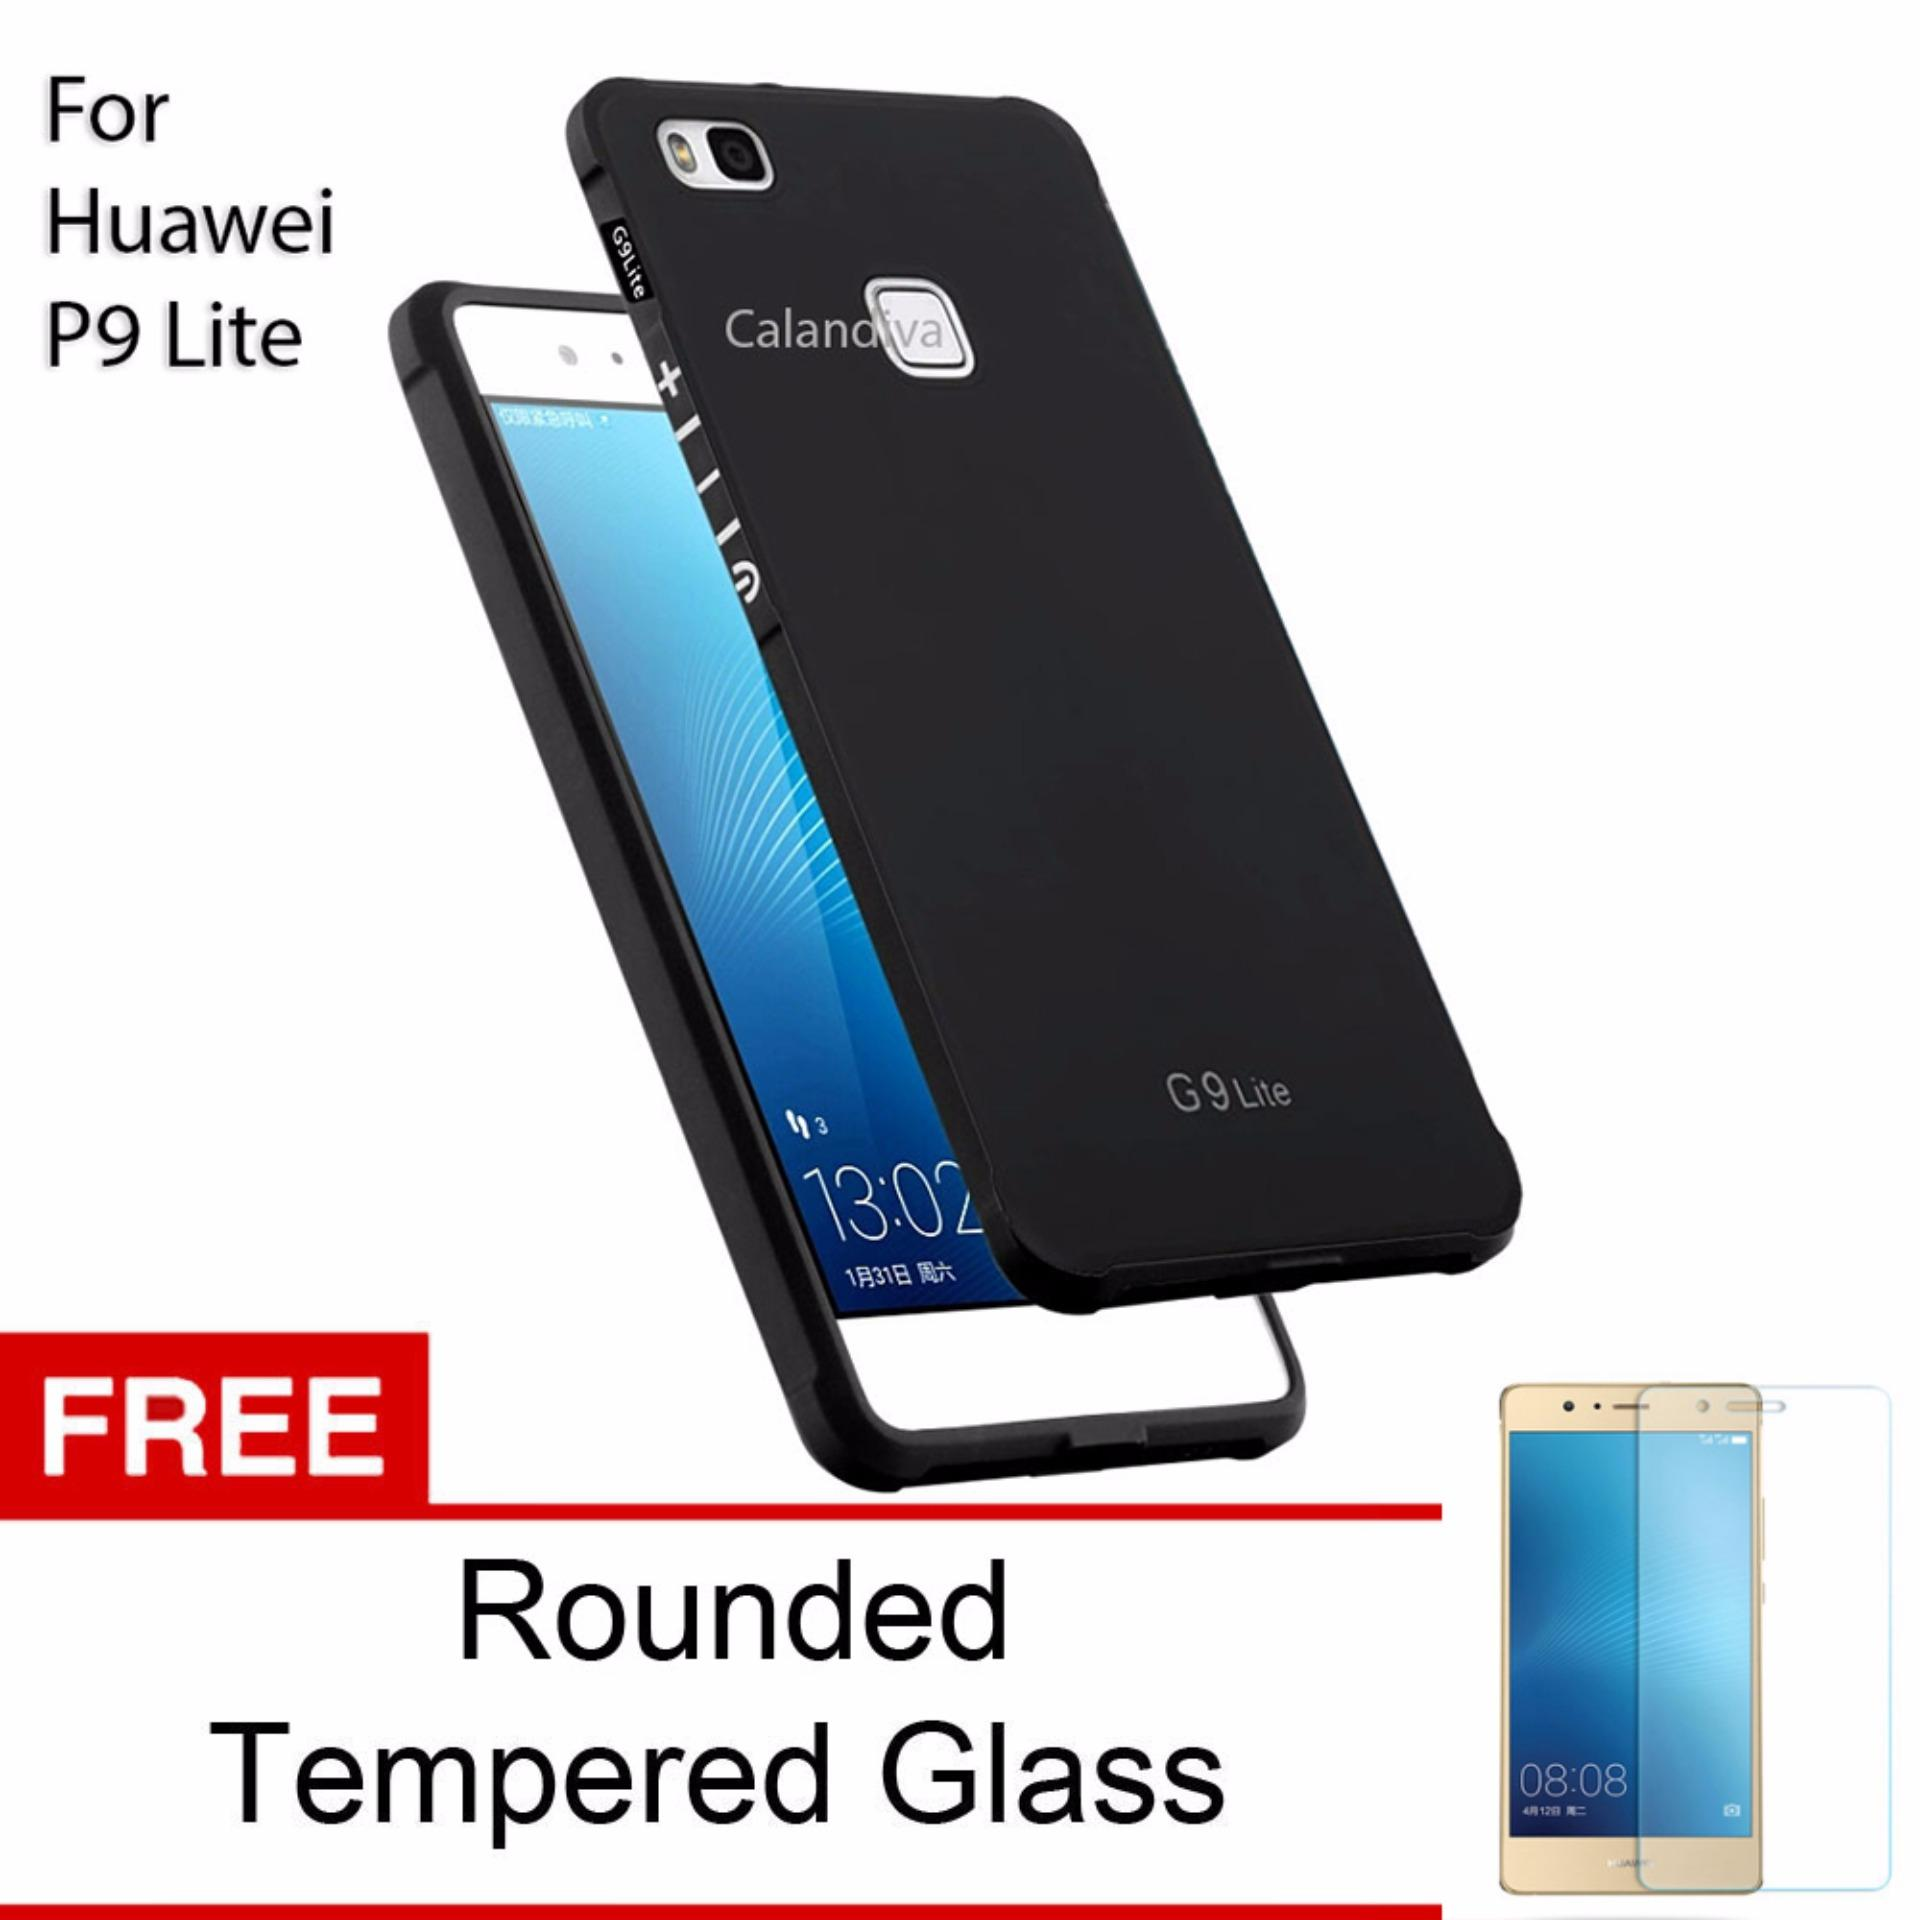 Calandiva Shockproof Hybrid Premium Quality Grade A Softcase for Huawei P9 Lite / G9 Lite - Hitam + Rounded Tempered Glass